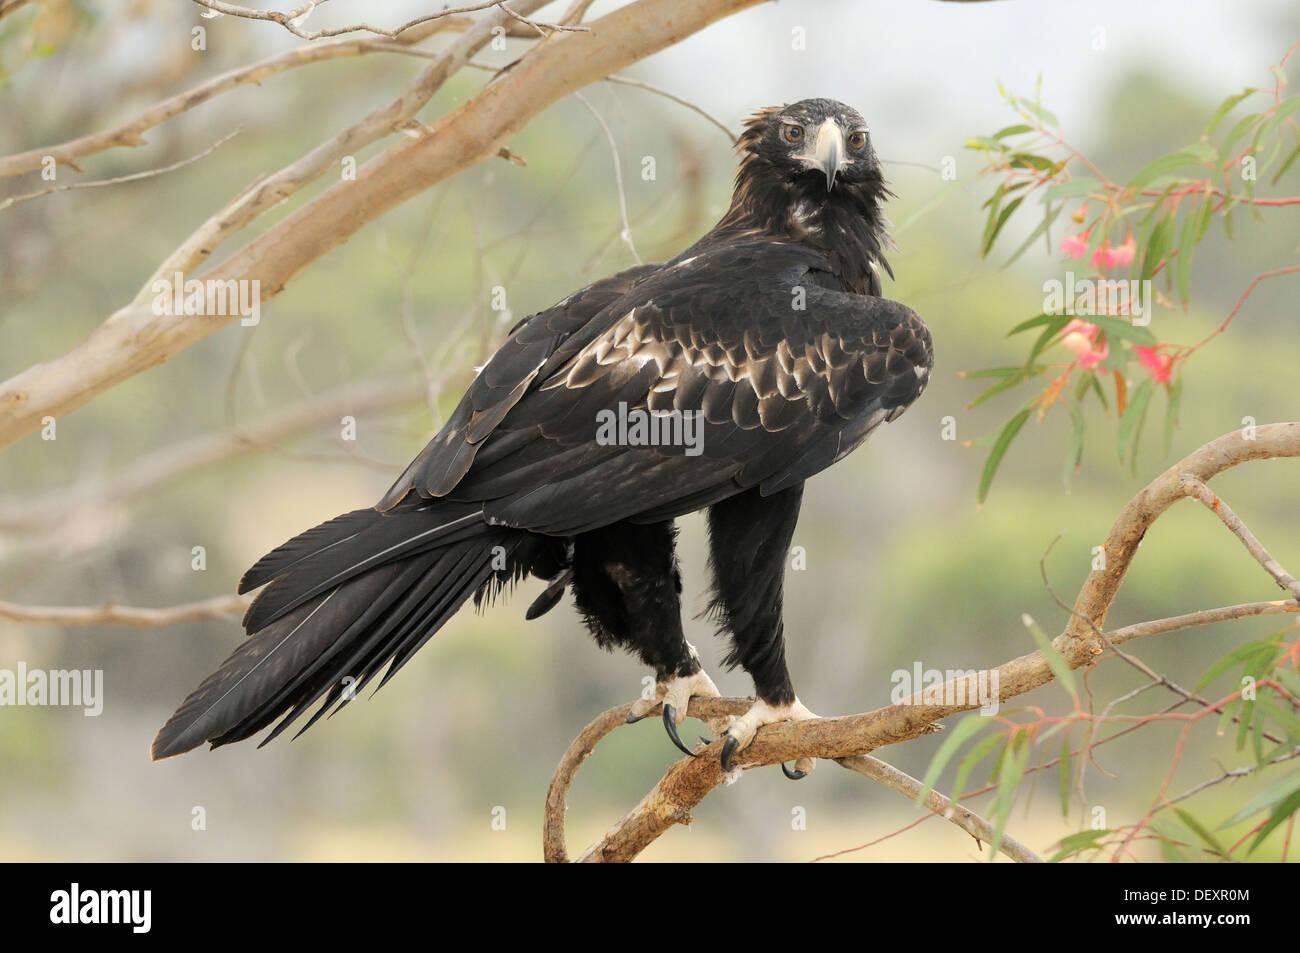 Wedge-tailed Eagle Aquila audax Adult Photographed in Tasmania, Australia - Stock Image